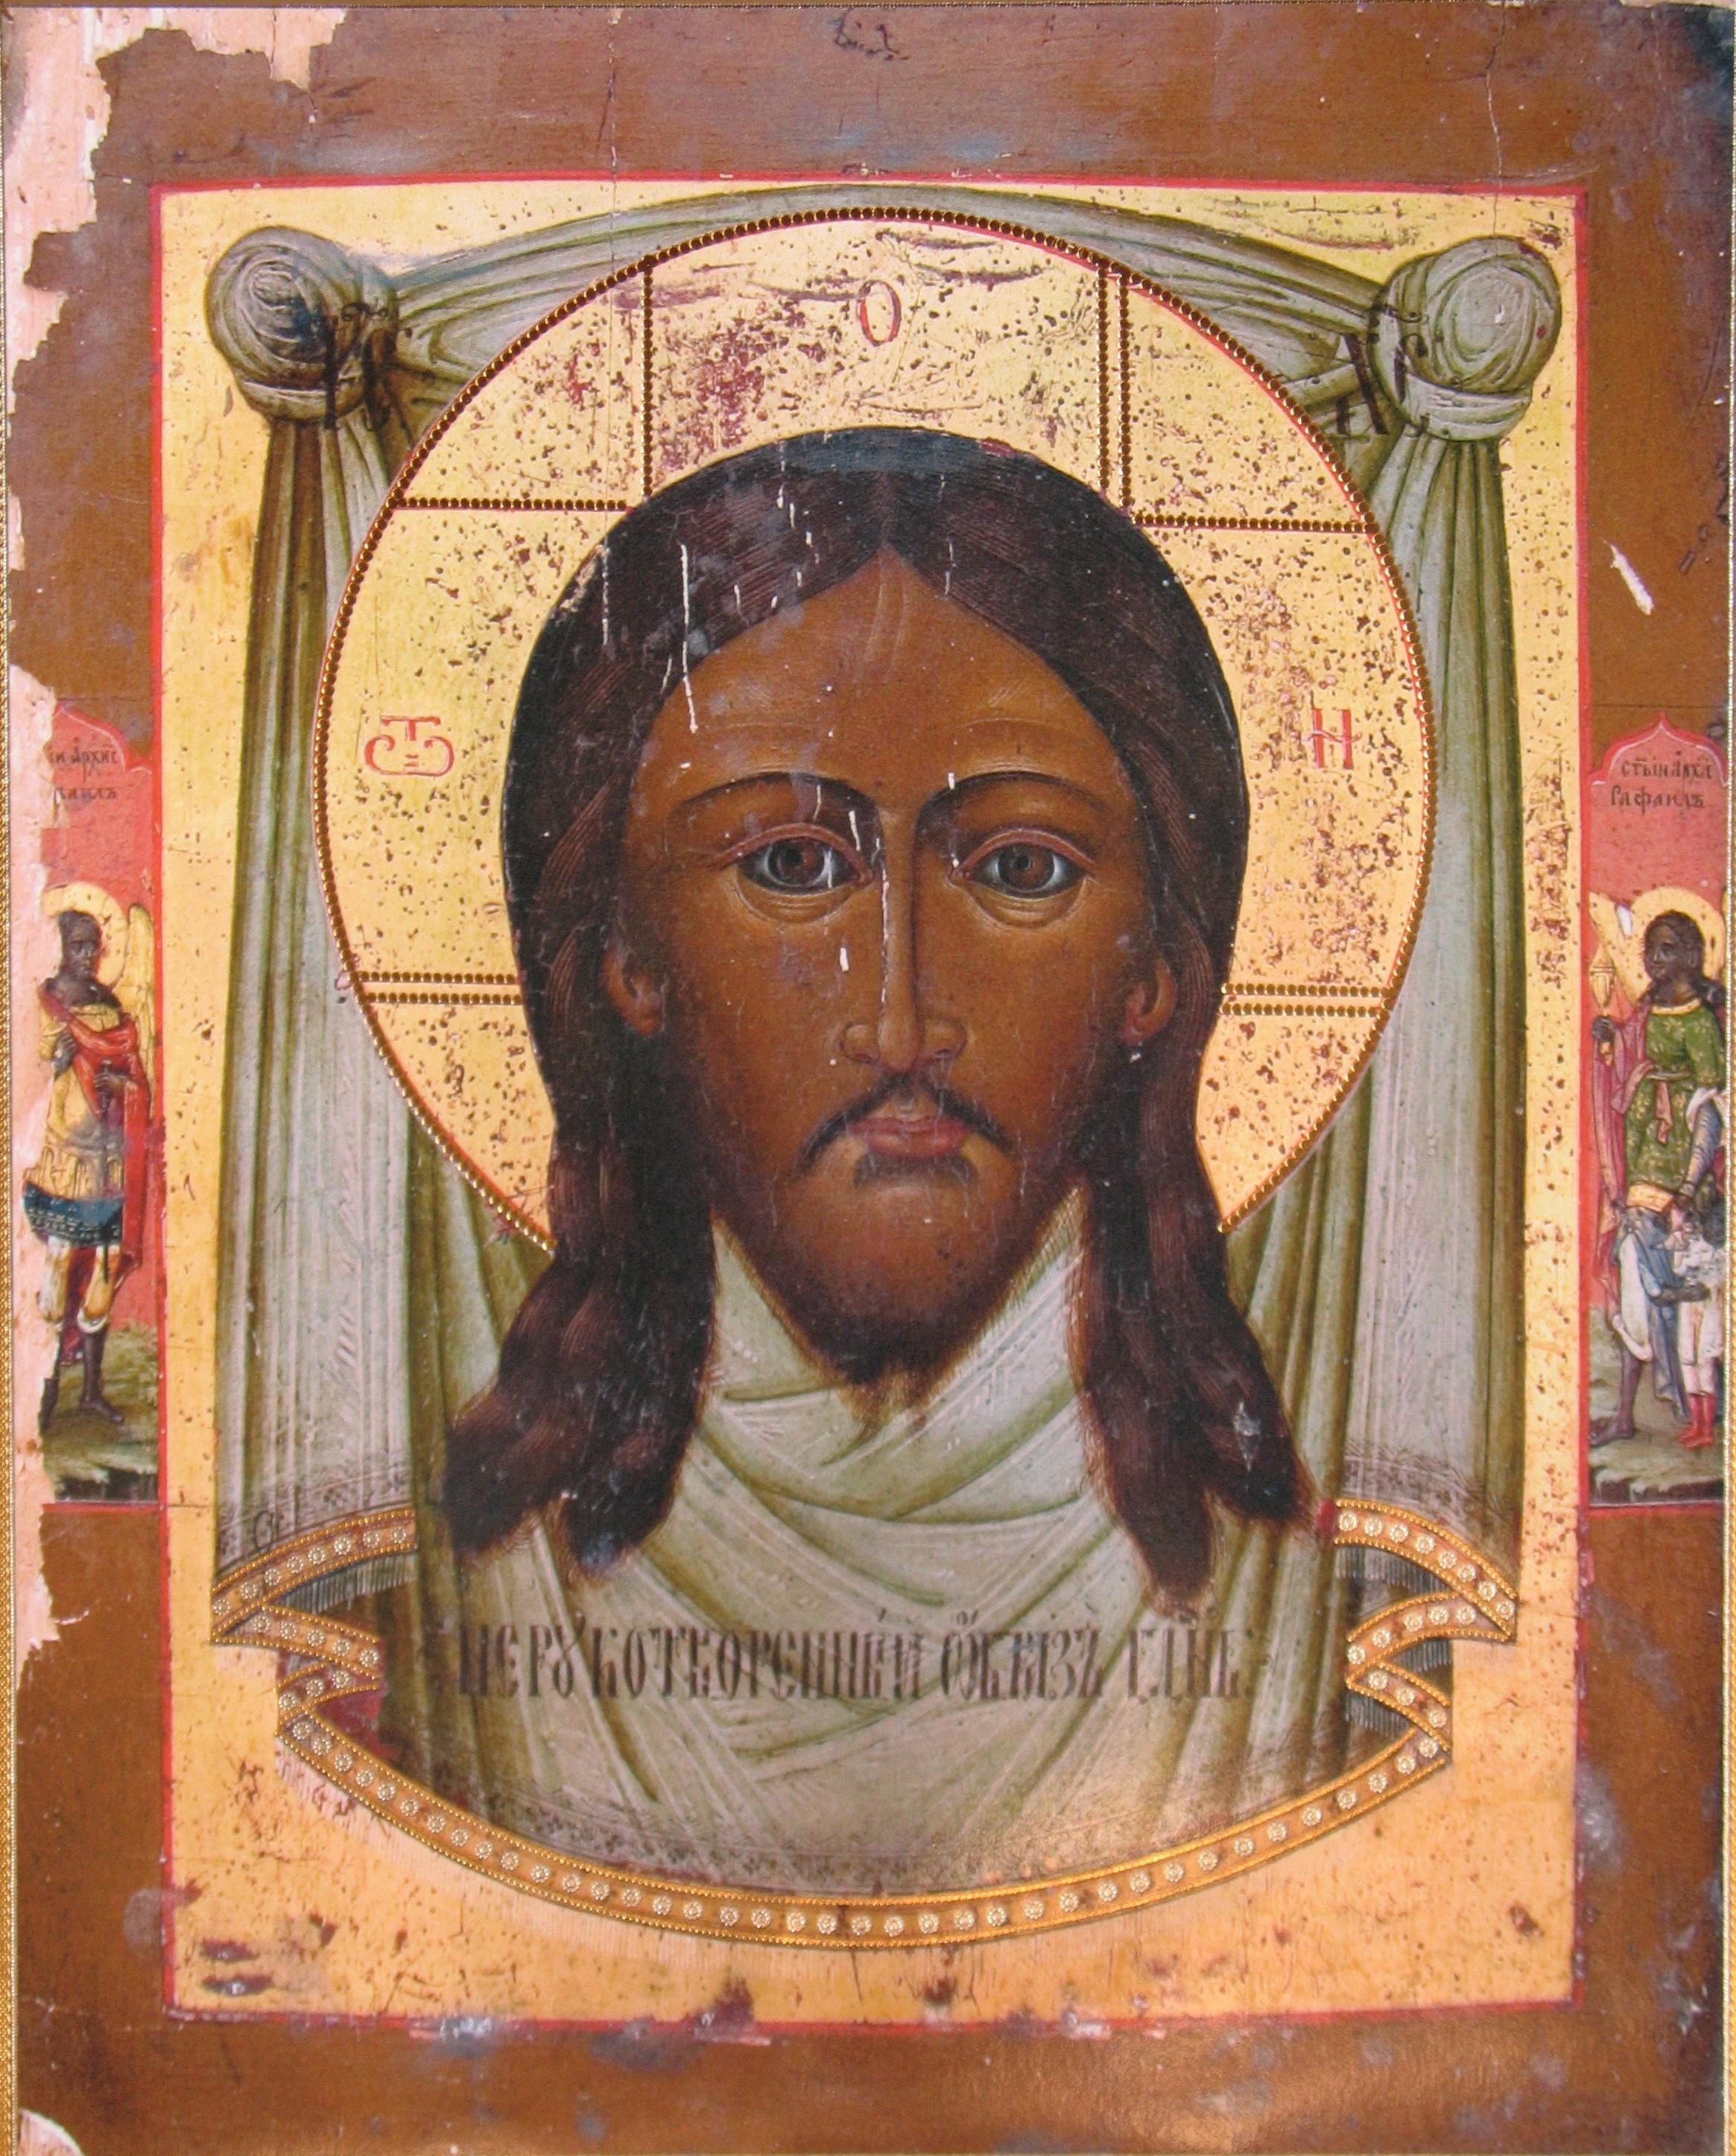 Harkovskij-Spas-Saviour-Orthodox-icon-18th-century-Harkov